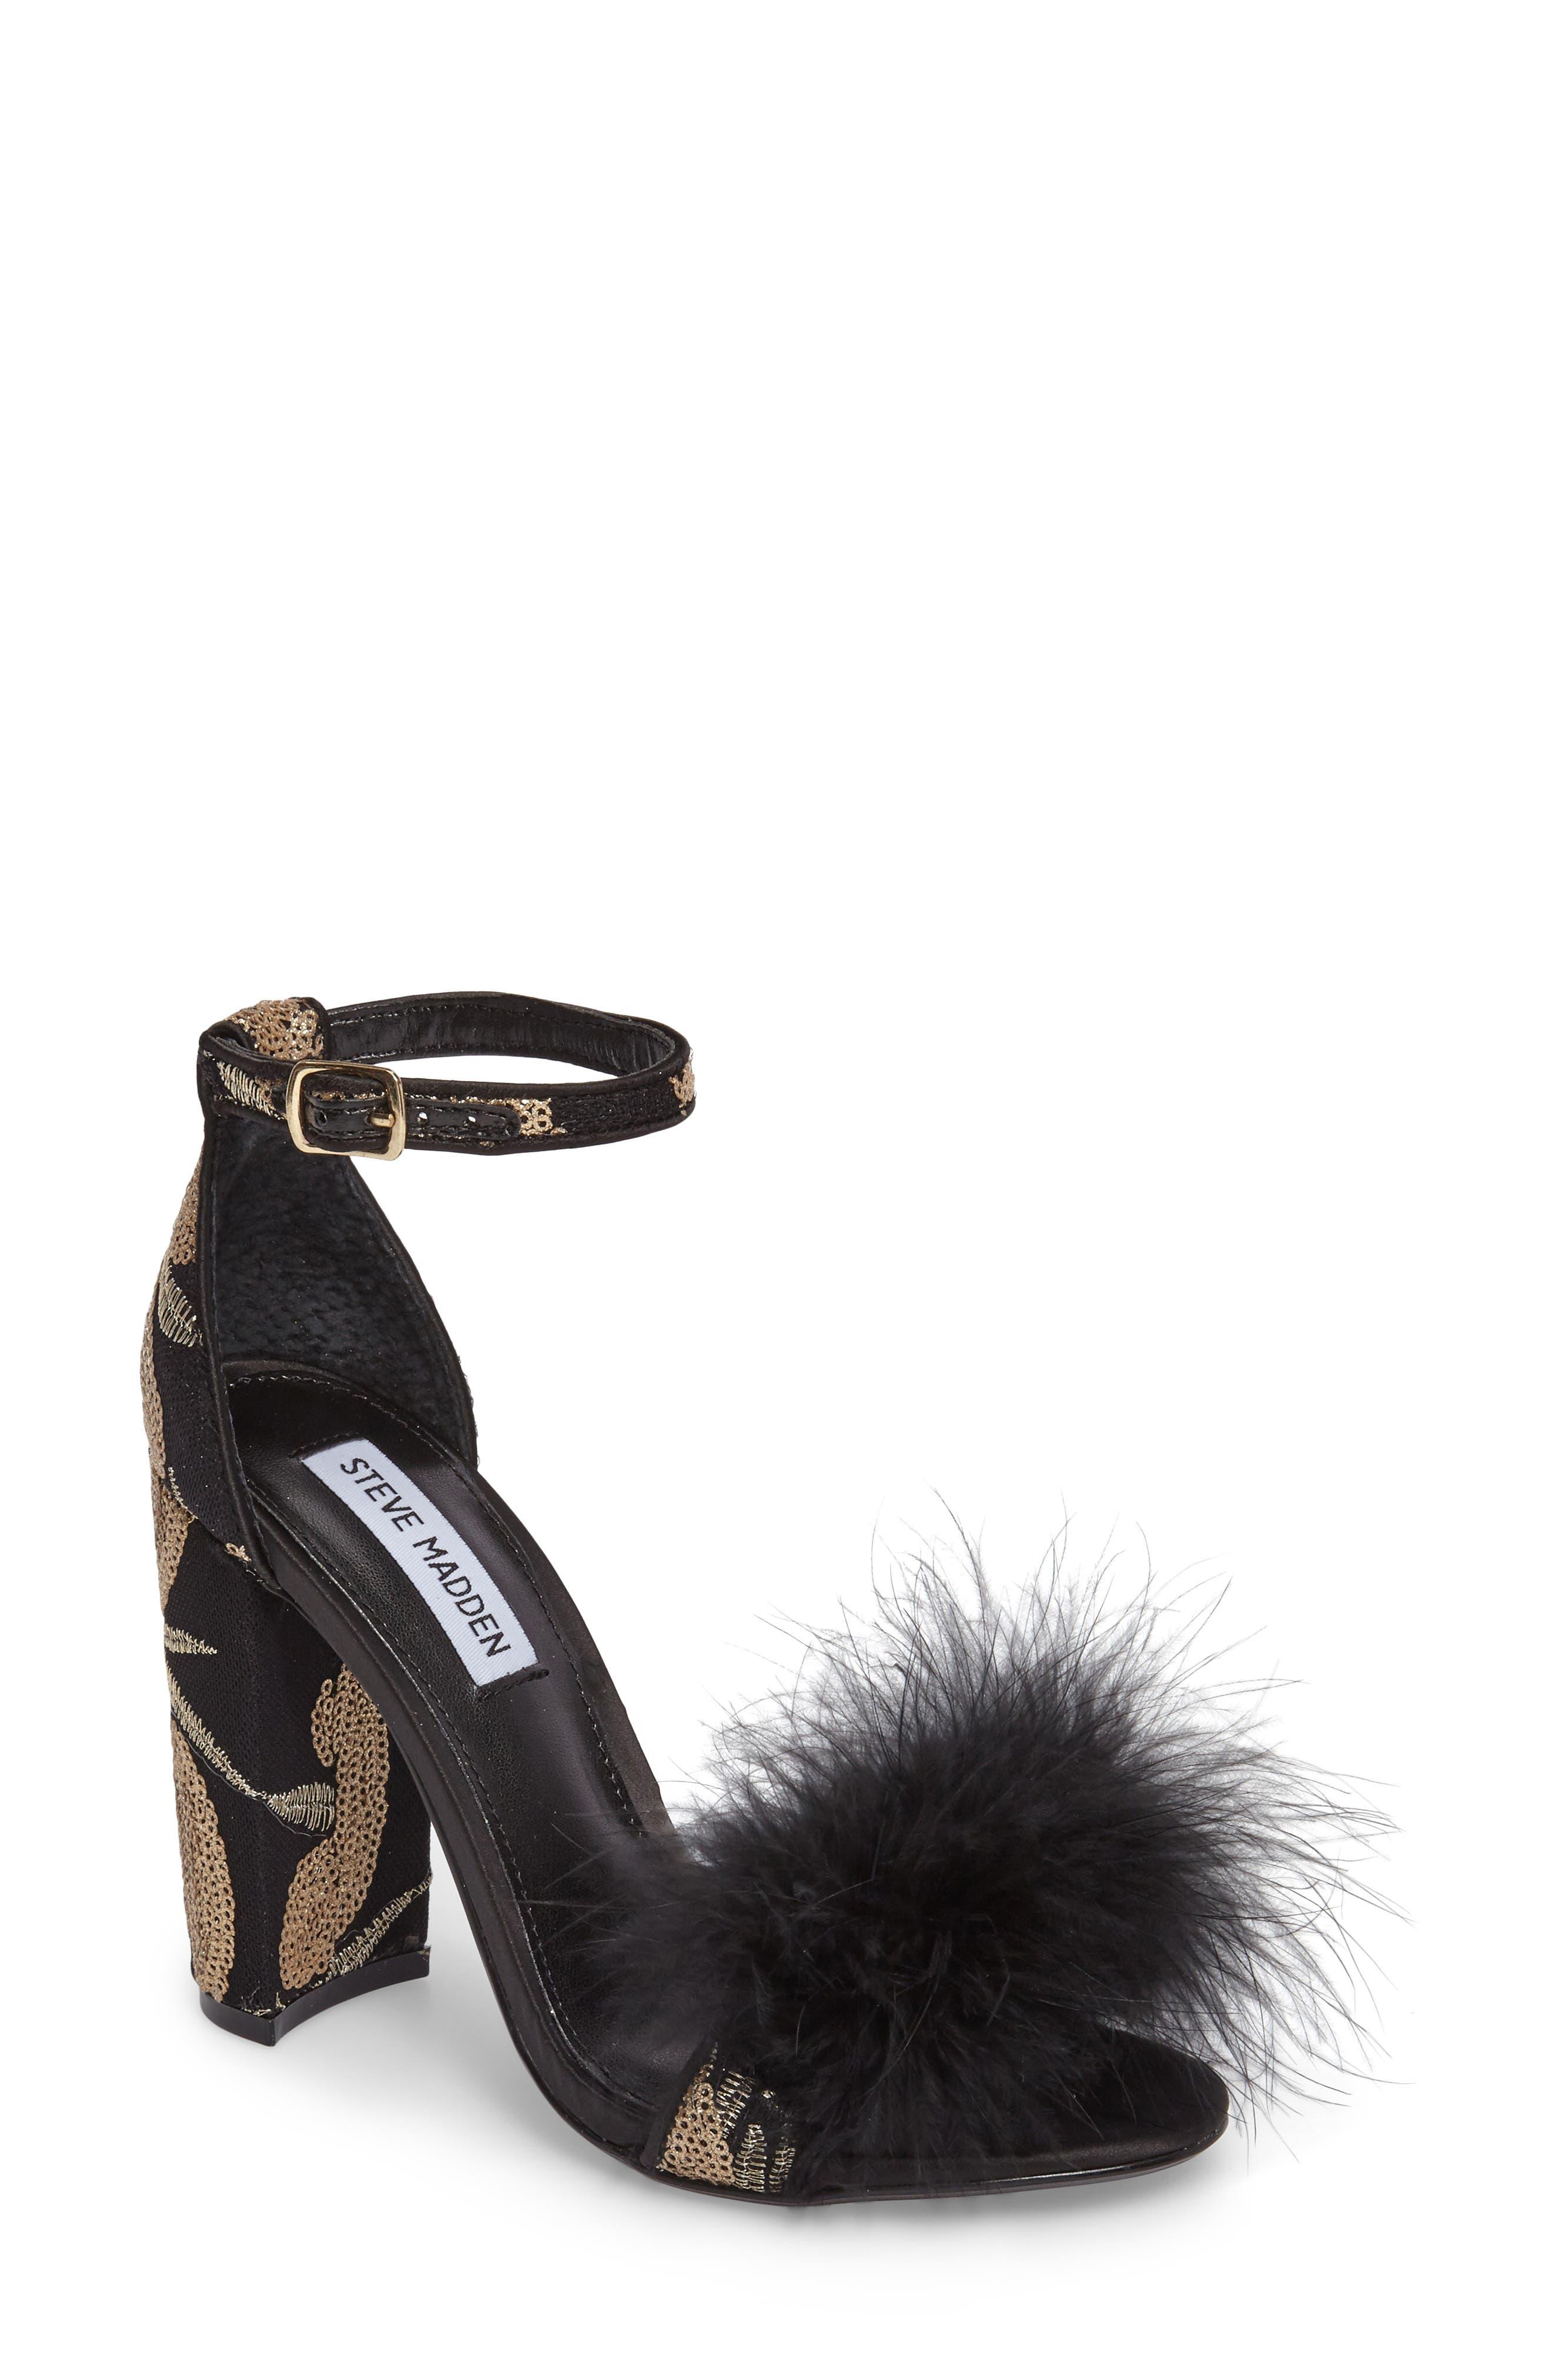 Carabu Sandal,                         Main,                         color, 710